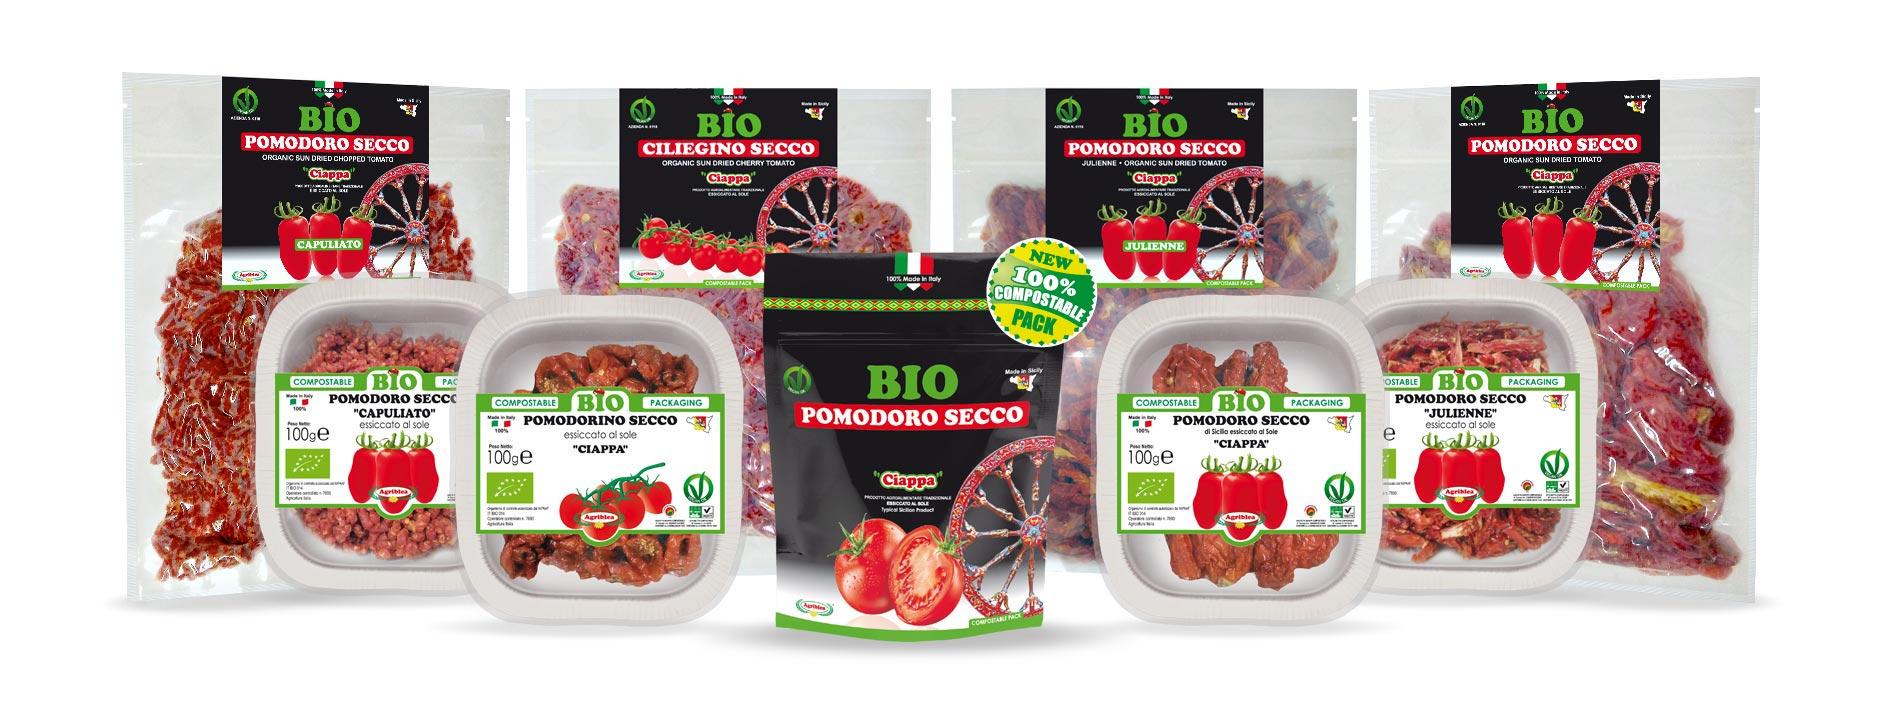 Pomodori BIO di Sicilia essiccati al Sole in buste 100% compostabili biodegradabili